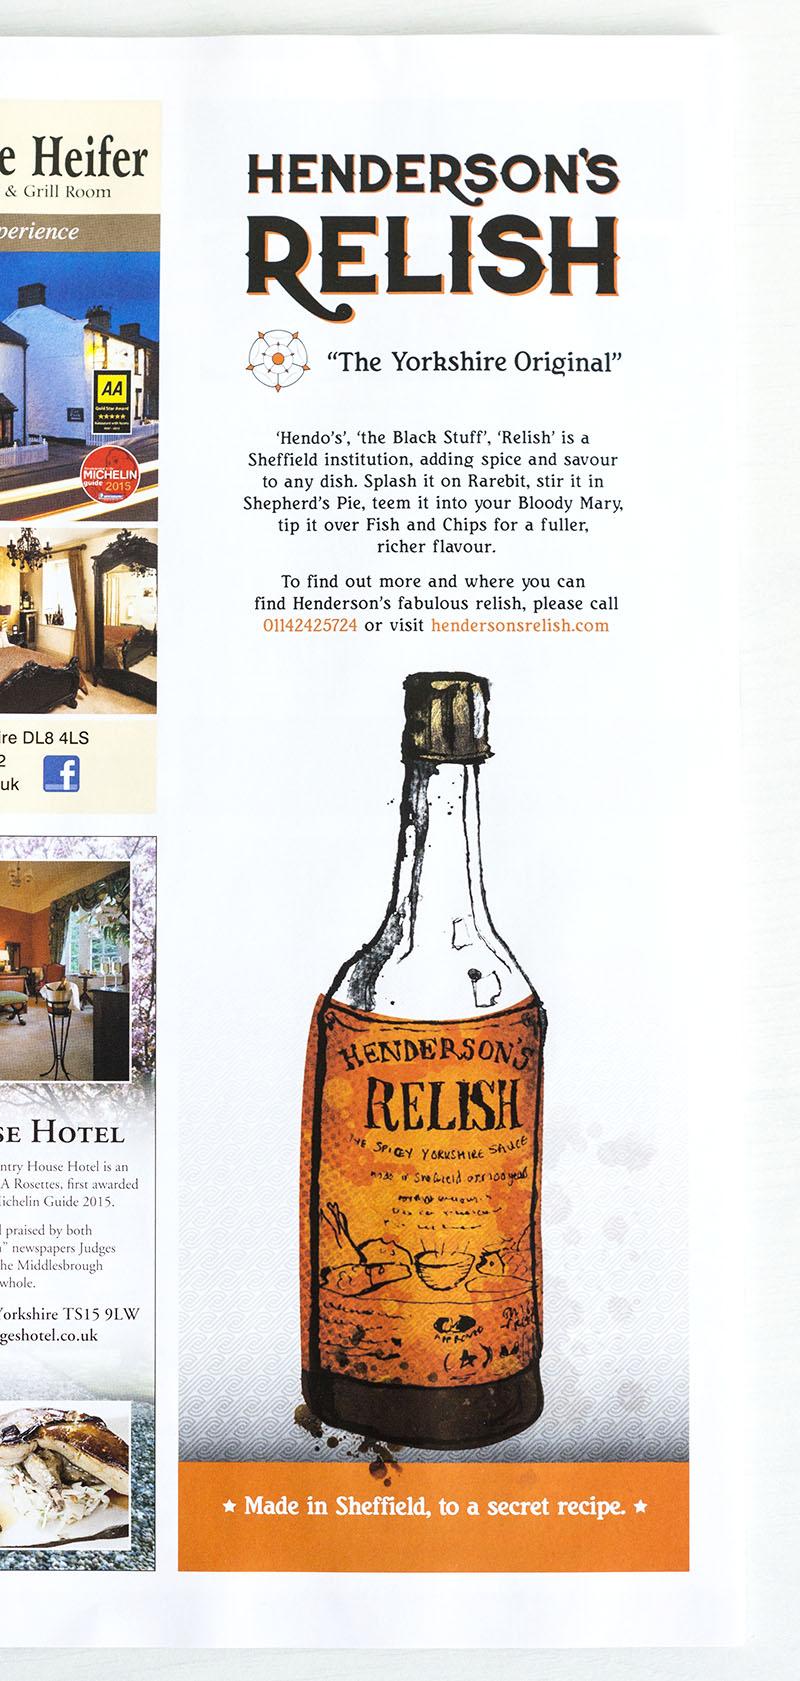 henderson's relish advert